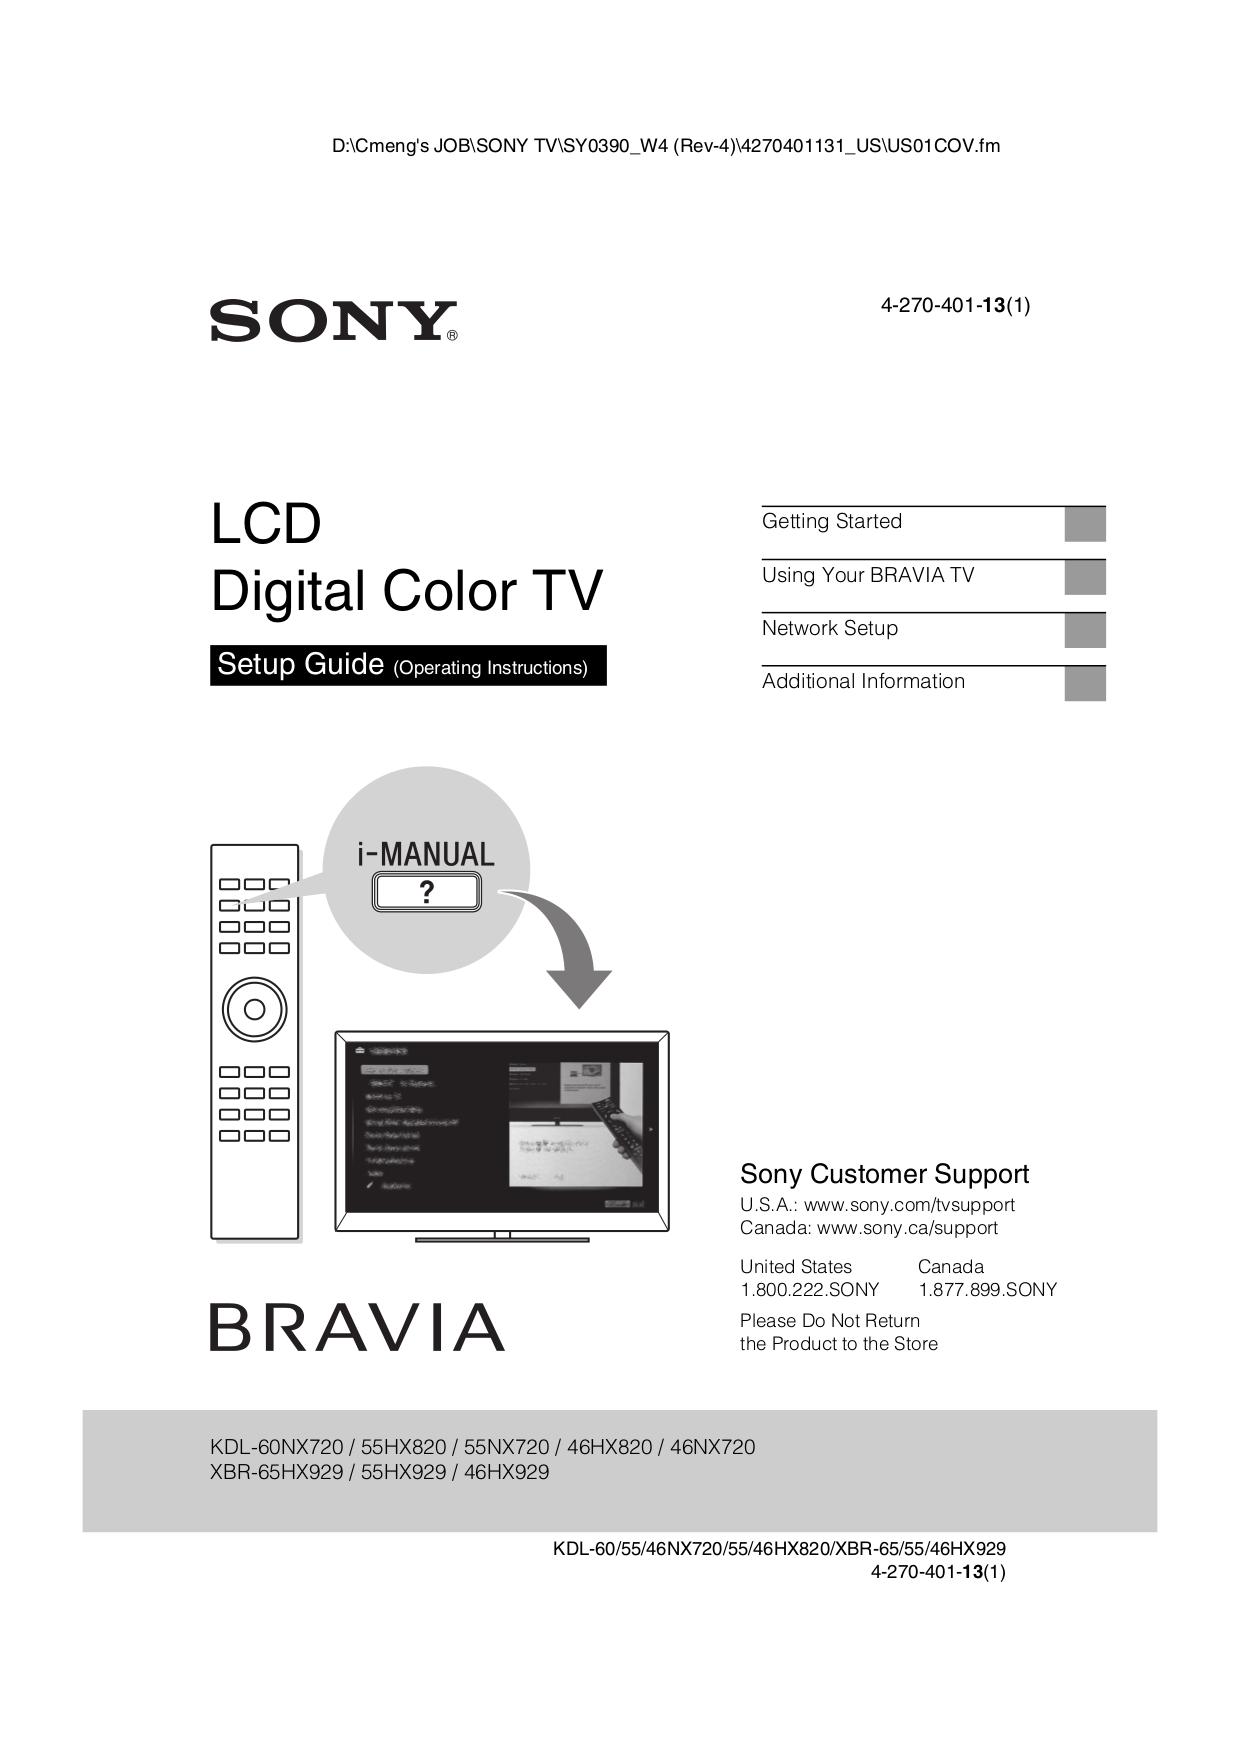 Sony Bravia Tv Schematic Modern Design Of Wiring Diagram Block Lcd Download Free Pdf For Xbr 55hx929 Manual Rh Umlib Com Smart 2008